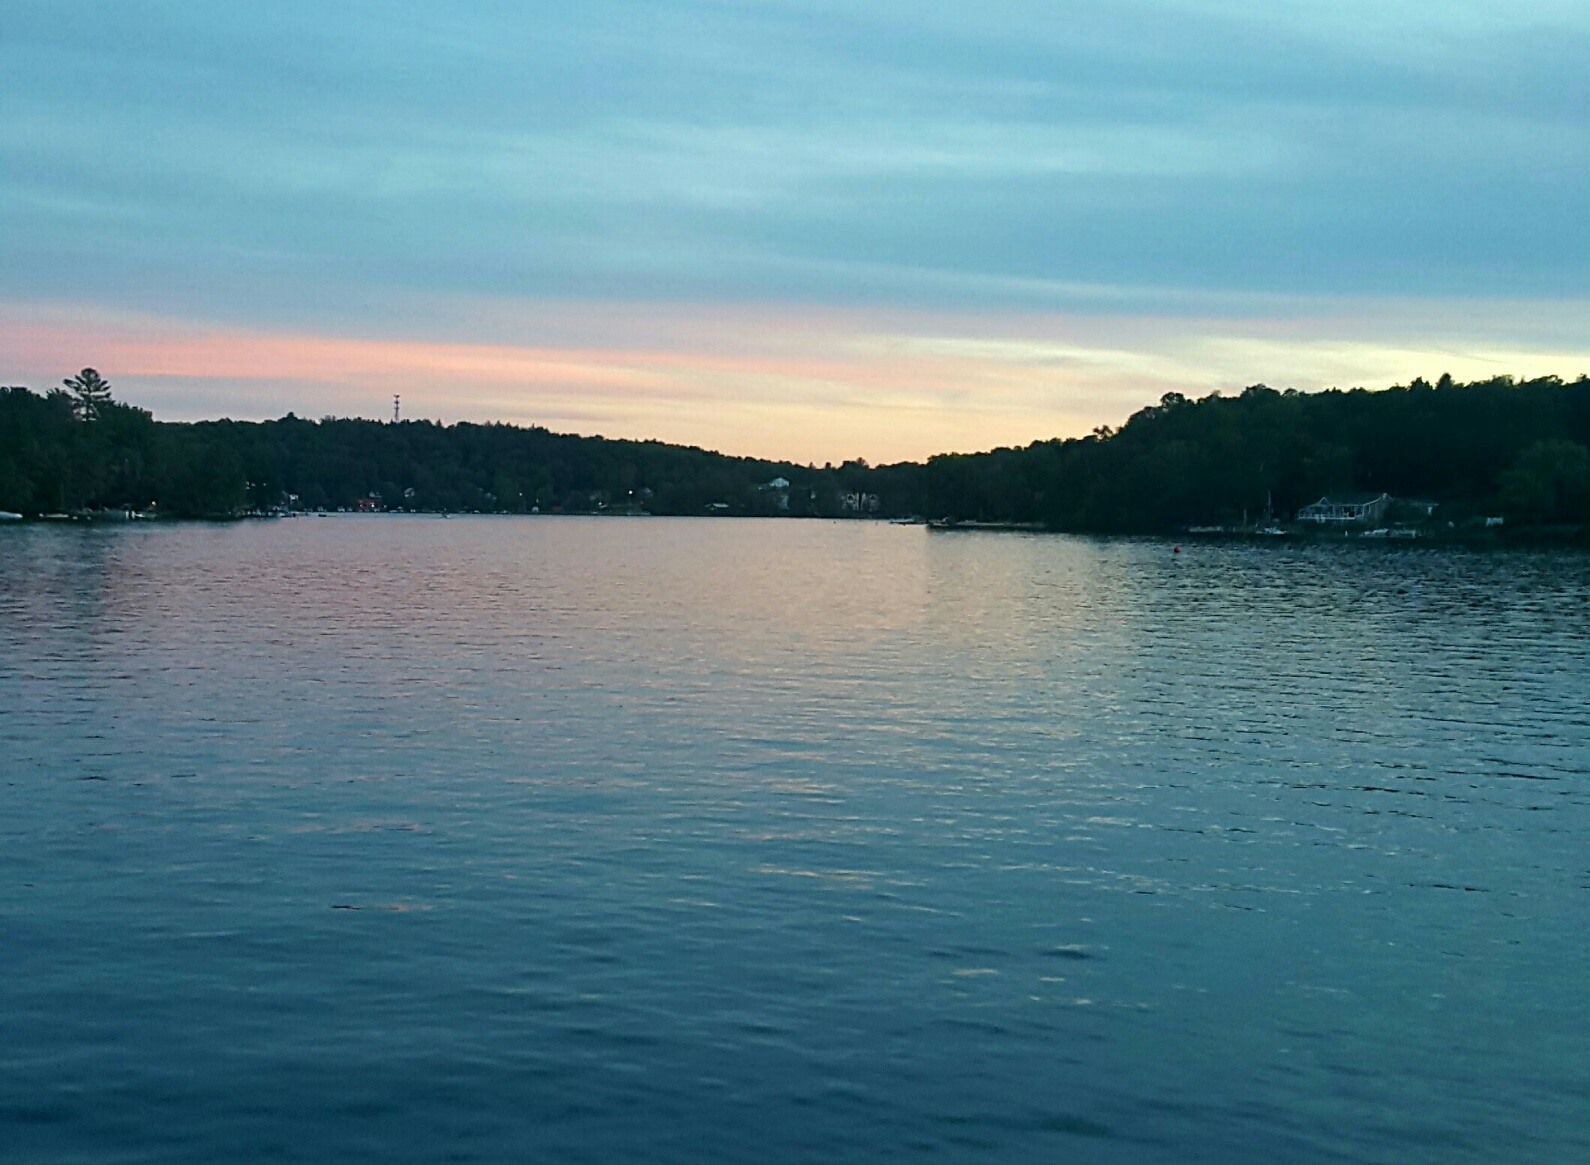 kauneonga lake Kauneonga lake tourism: tripadvisor has 202 reviews of kauneonga lake hotels, attractions, and restaurants making it your best kauneonga lake resource.